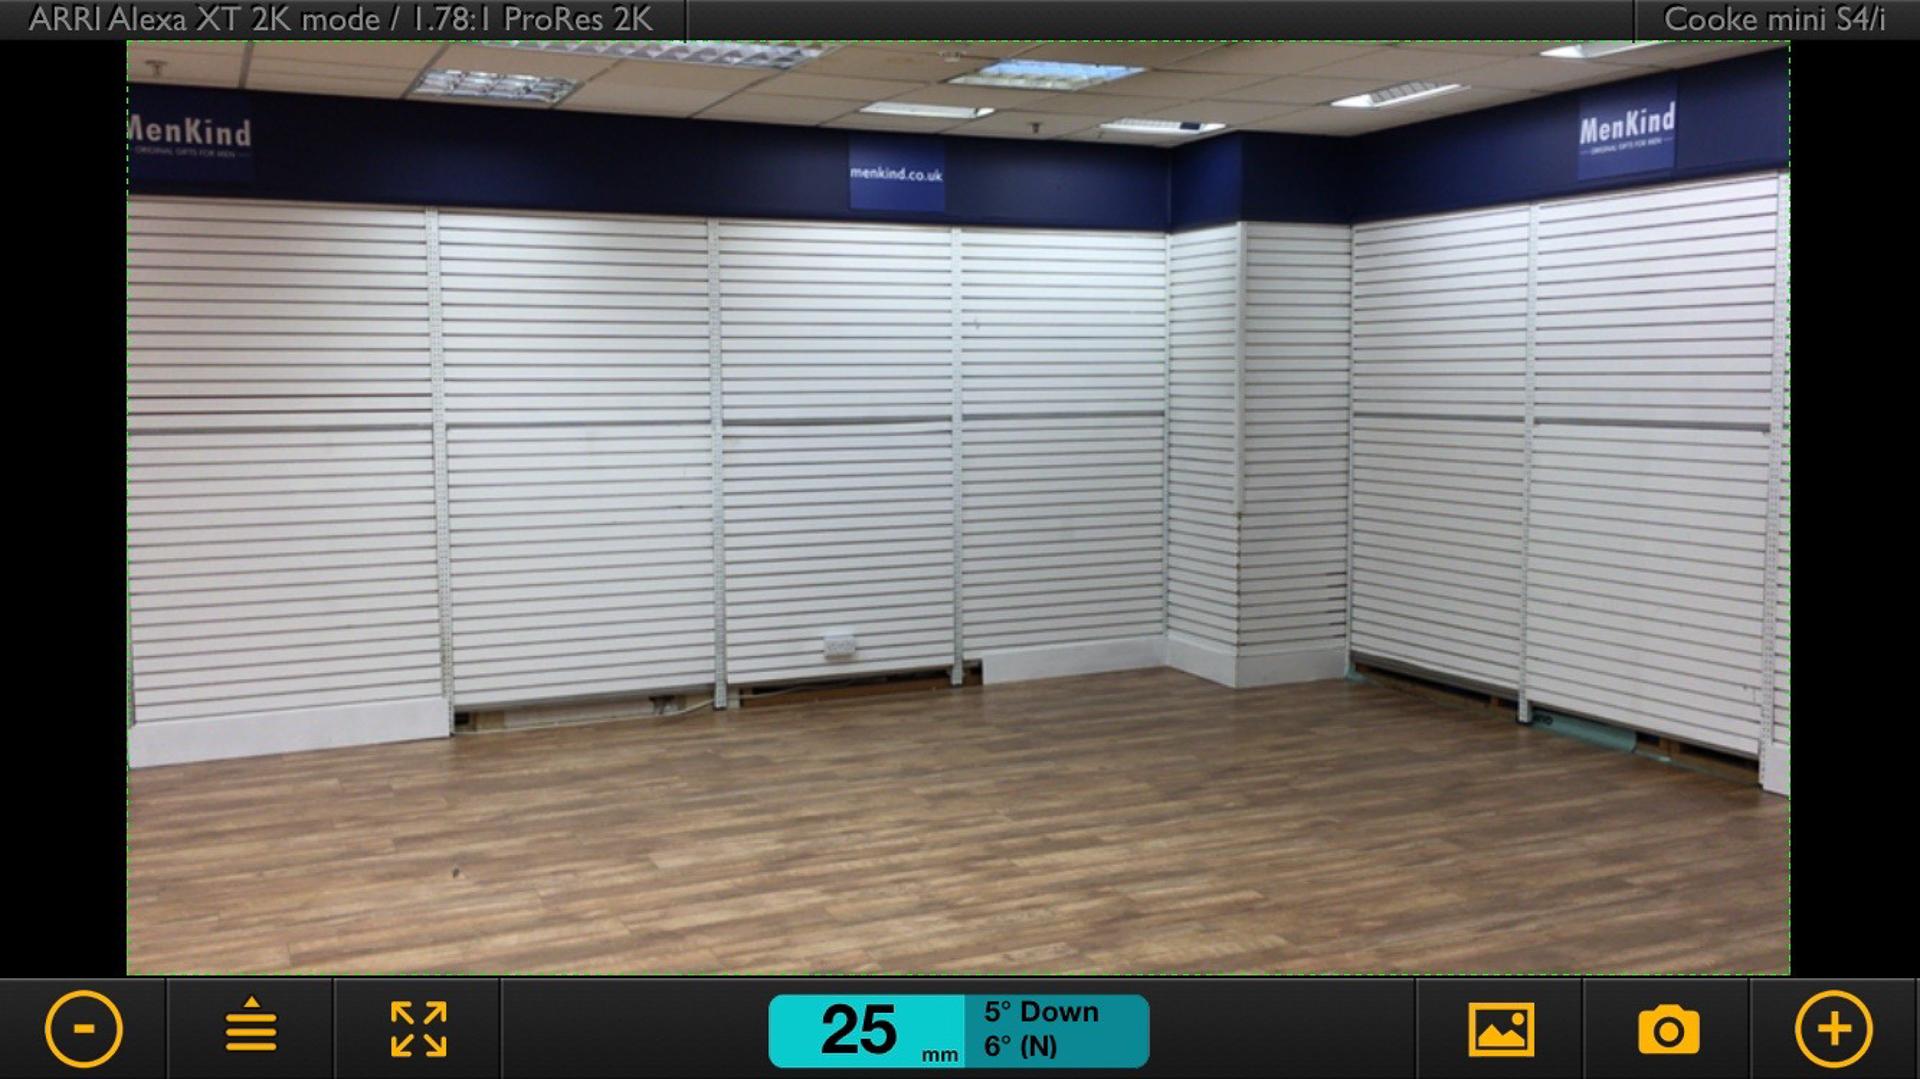 Location No. 1 - Barebones MenKind Shop